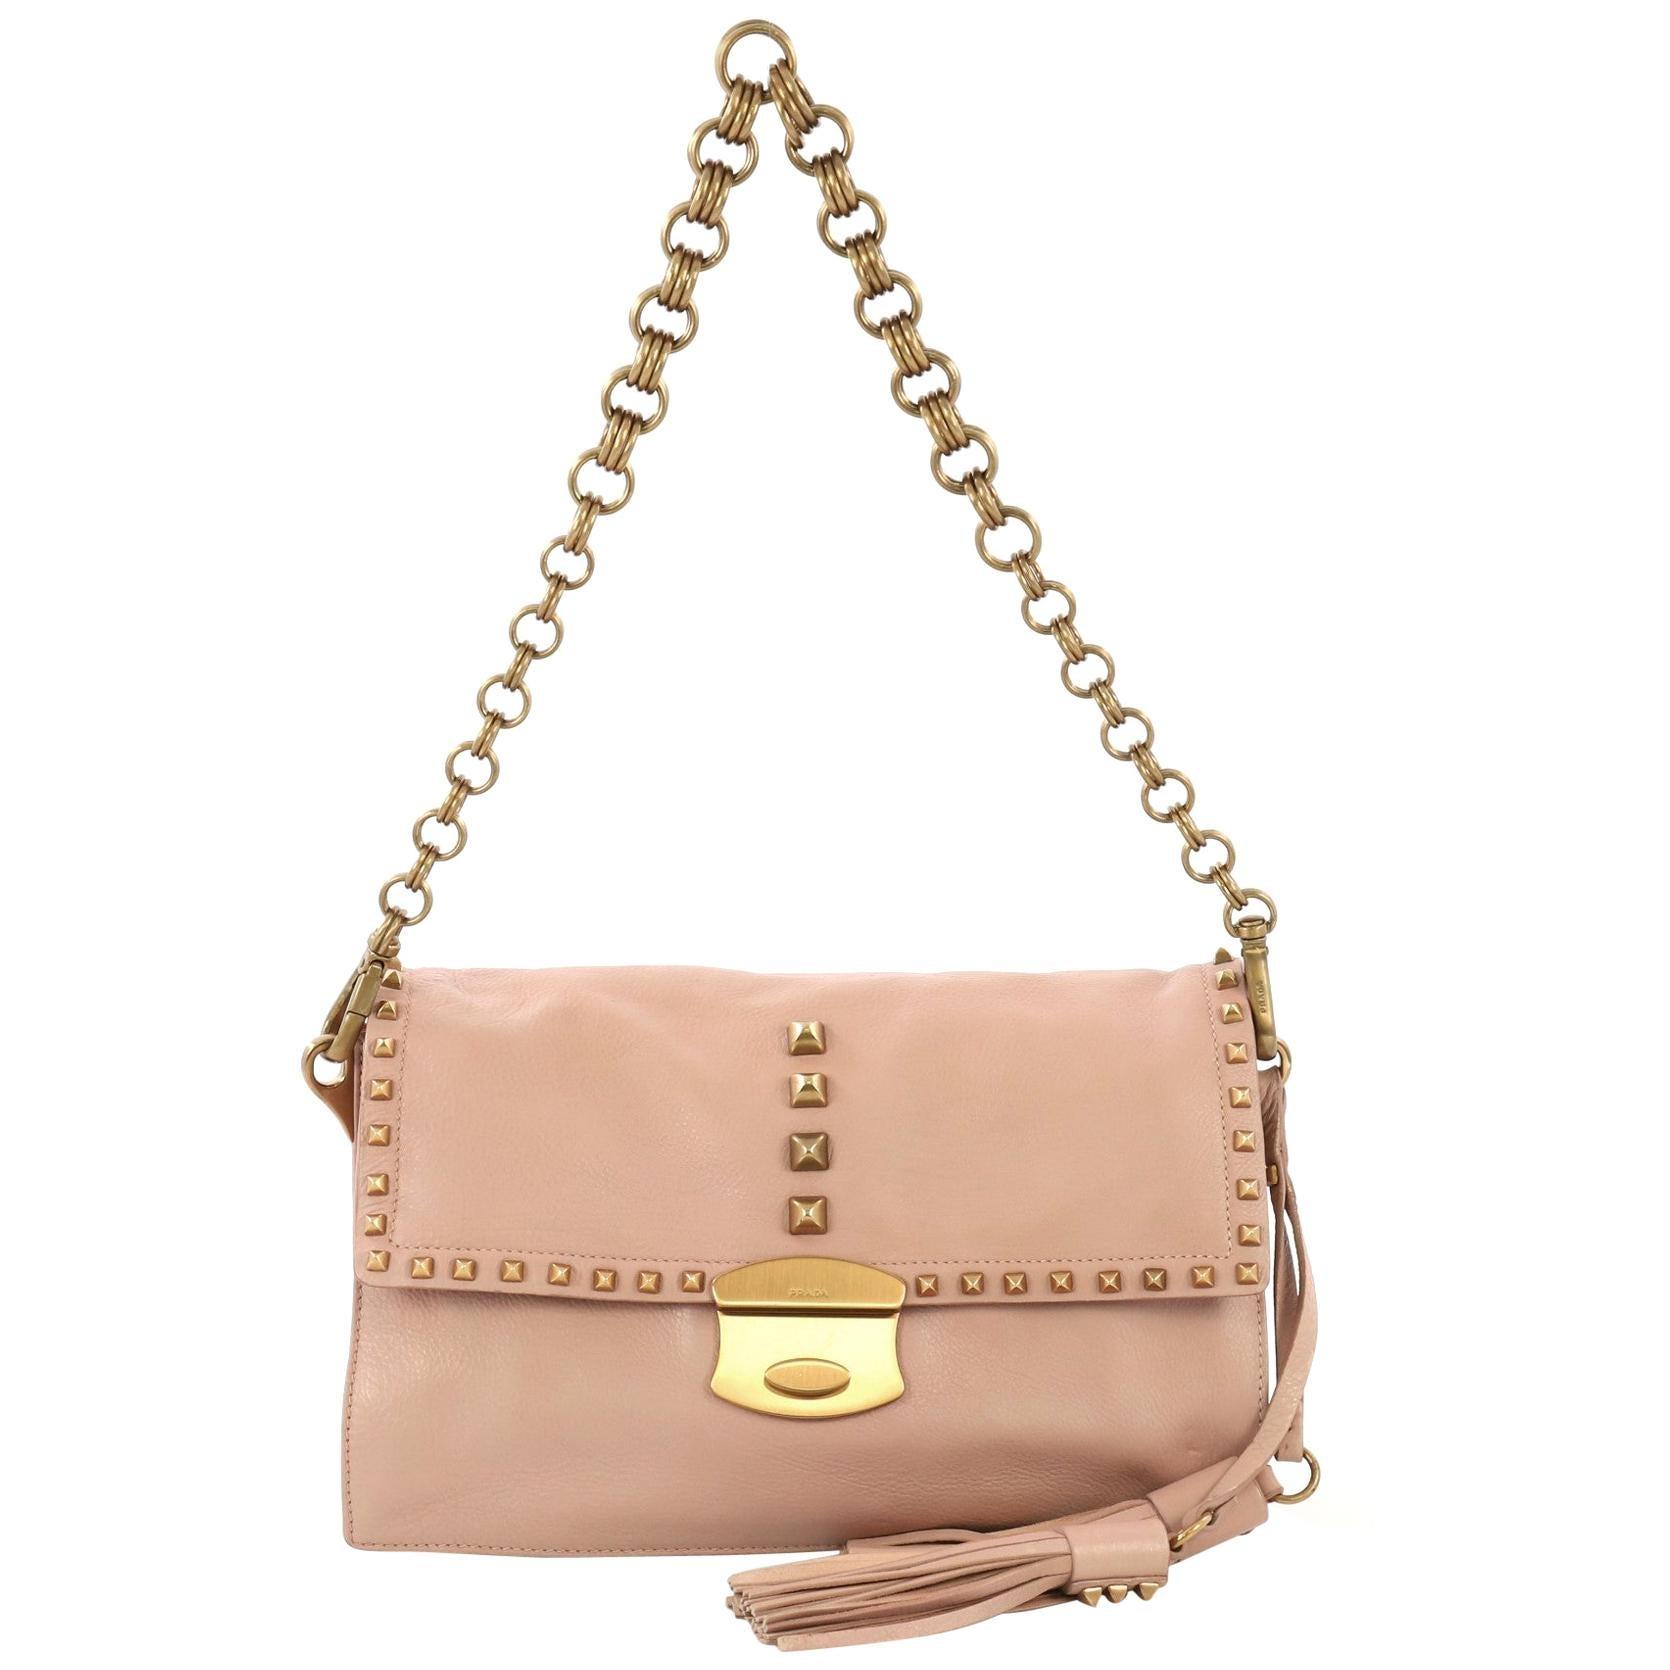 5c867c0856b2 Vintage Prada Handbags and Purses - 1,246 For Sale at 1stdibs